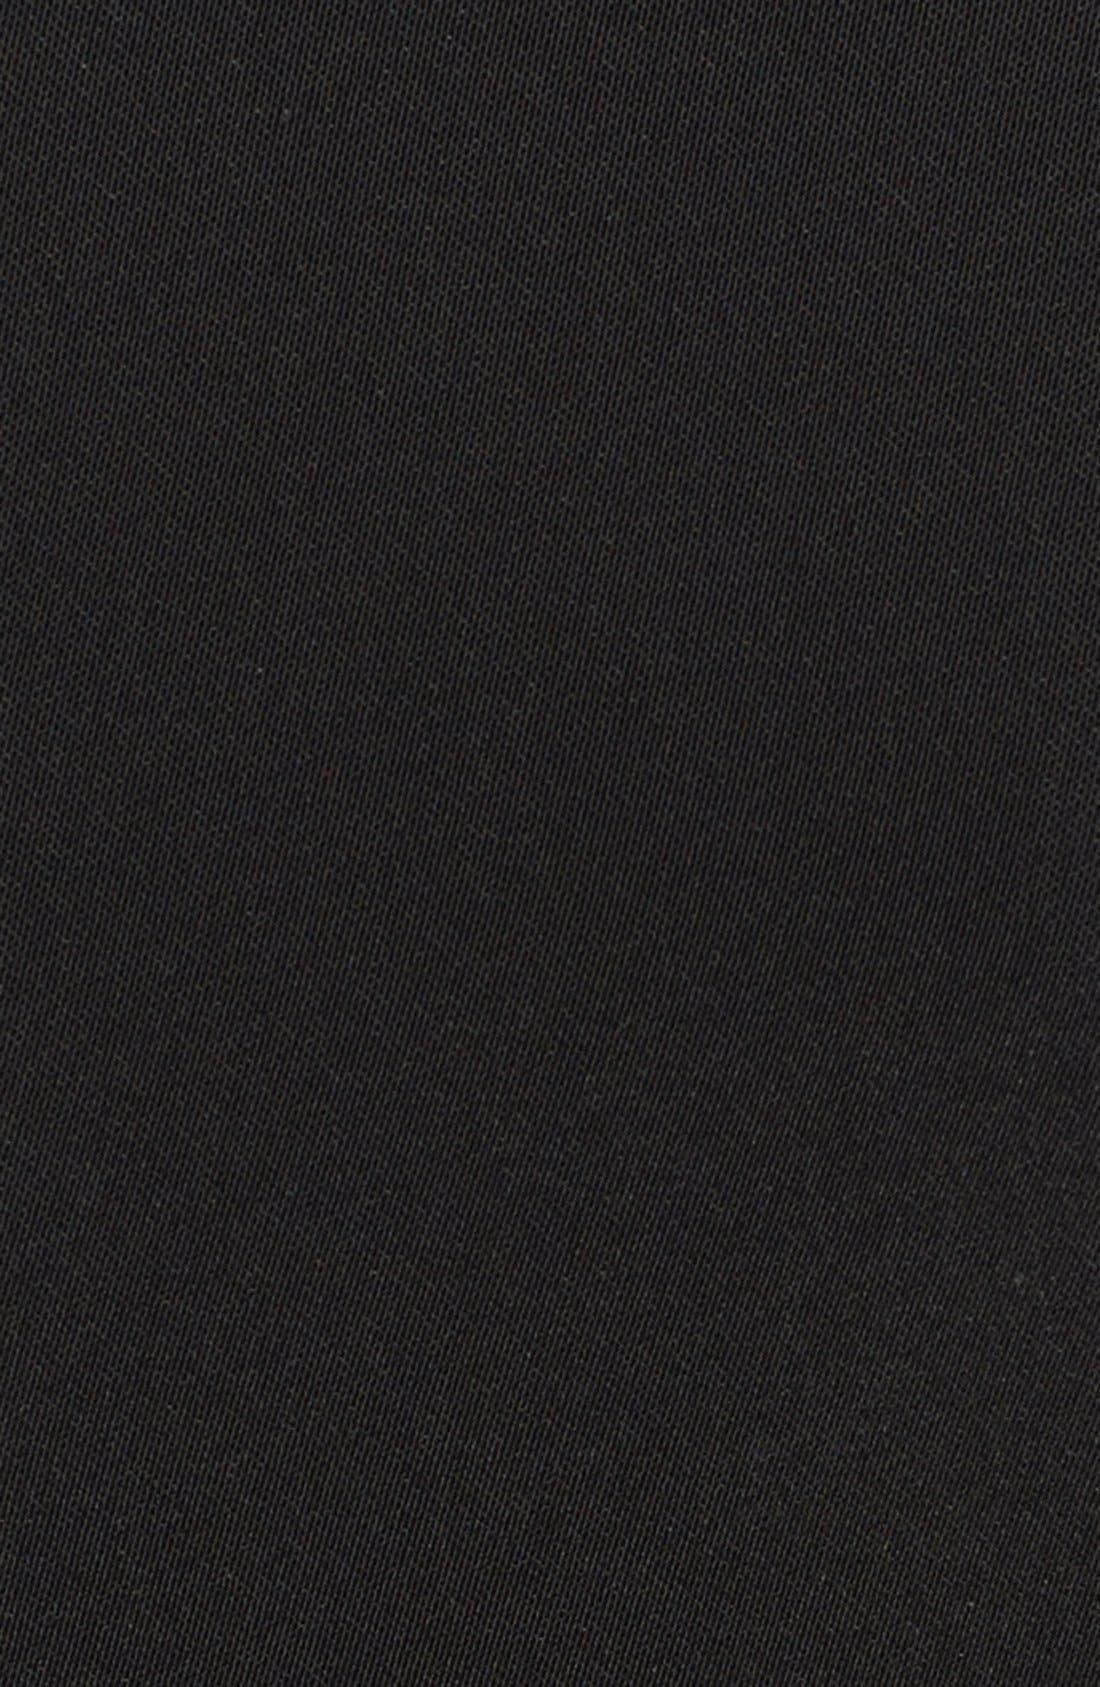 Alternate Image 3  - Alex Evenings Embellished Mesh & Crepe Sheath Dress (Petite)